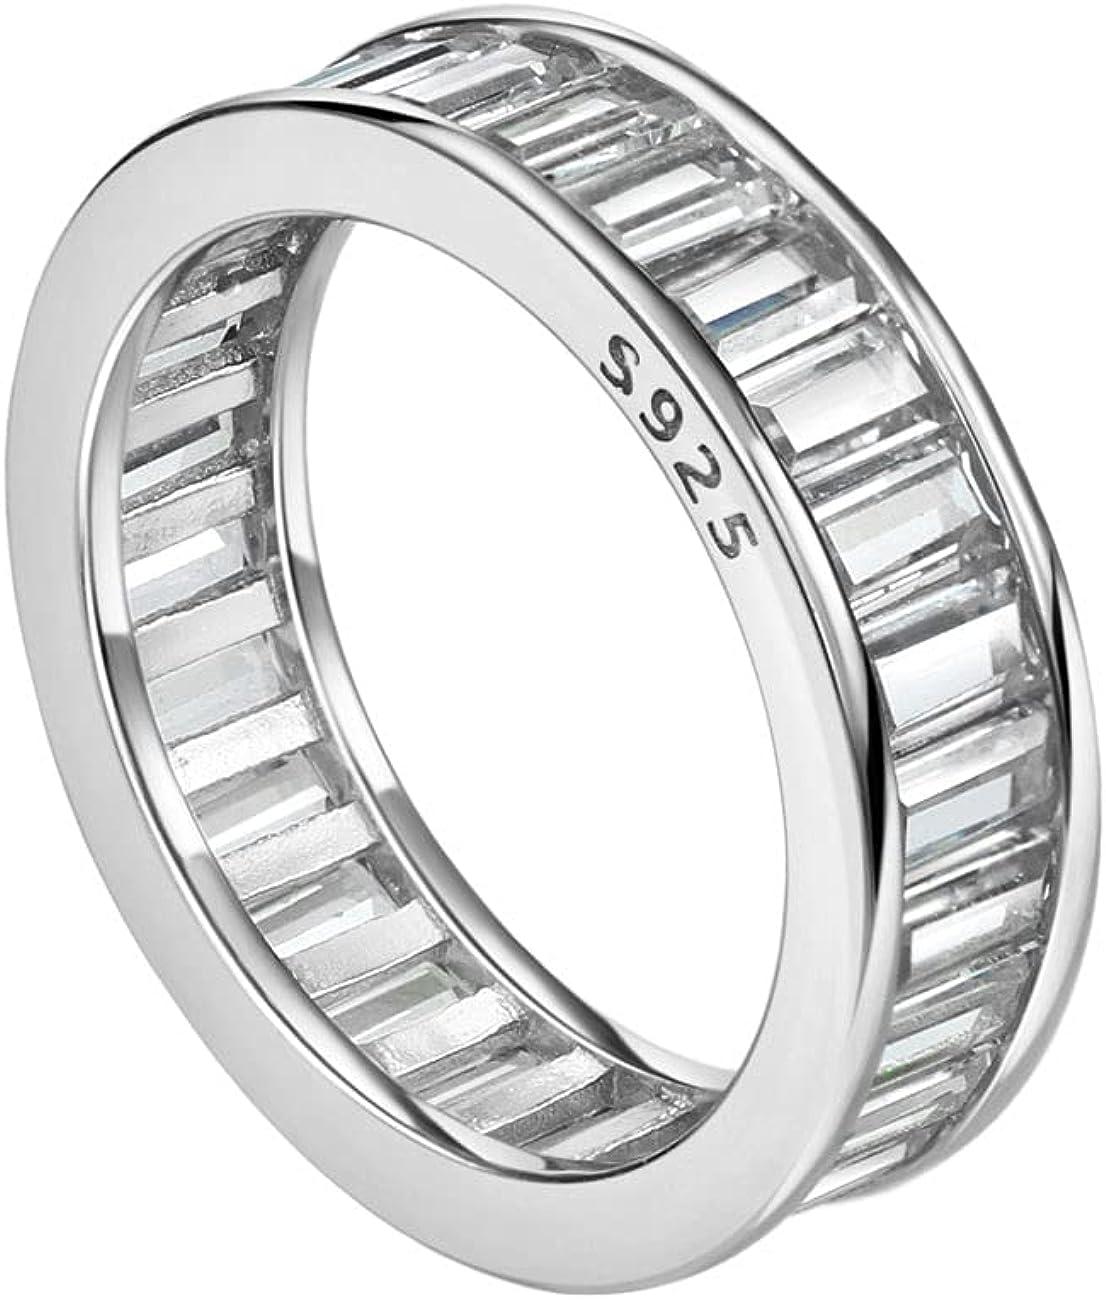 Michooyel S925 Emerald Cut Sale item Eternity Free shipping on posting reviews Setting Ring Channel Wedding